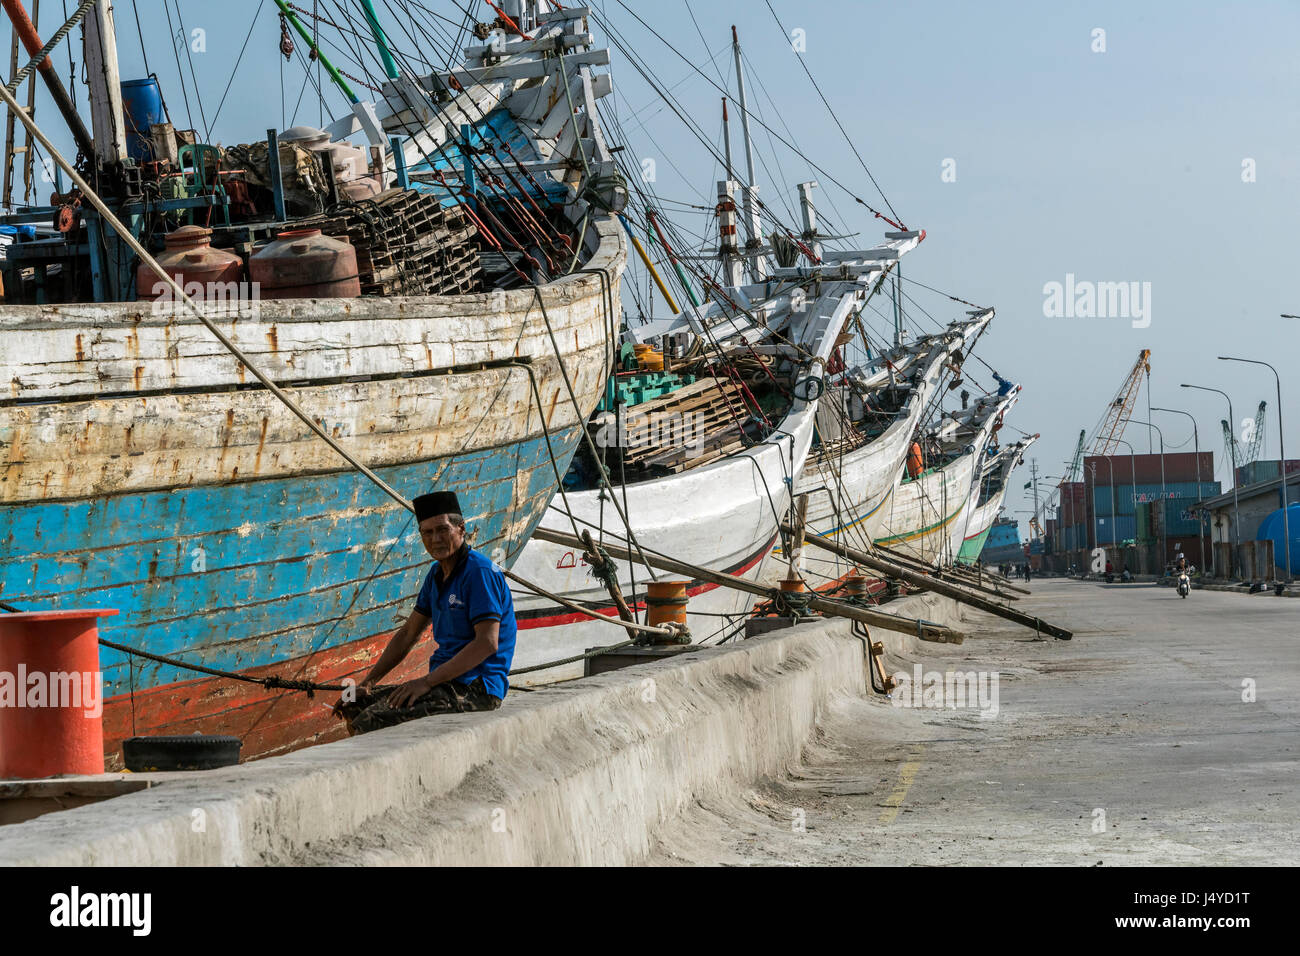 Pinisi at the wharf at Sunda Kelapa, Jakarta, Indonesia - Stock Image